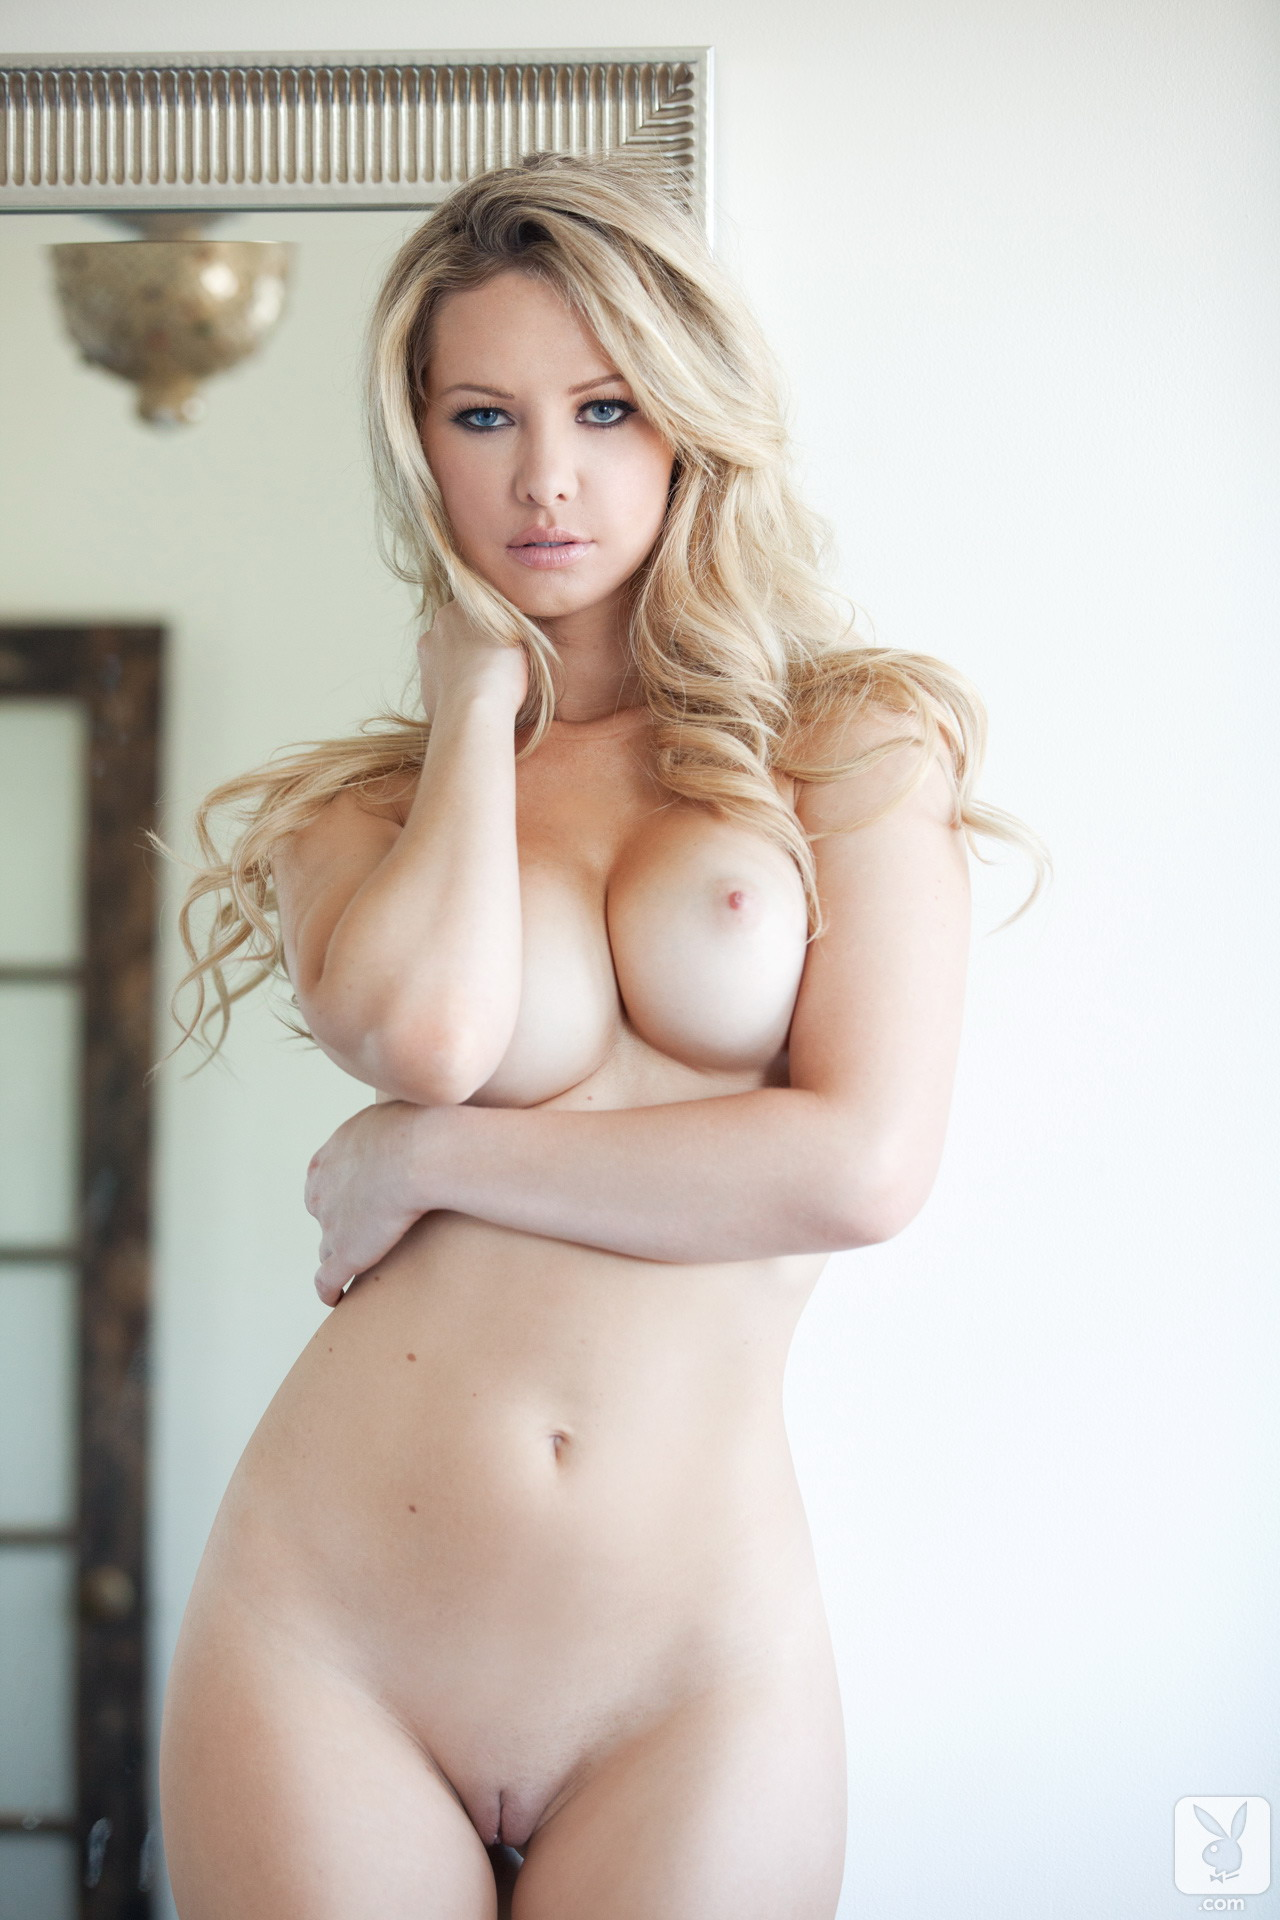 Tiffany toth free porn videos best porn stars tube